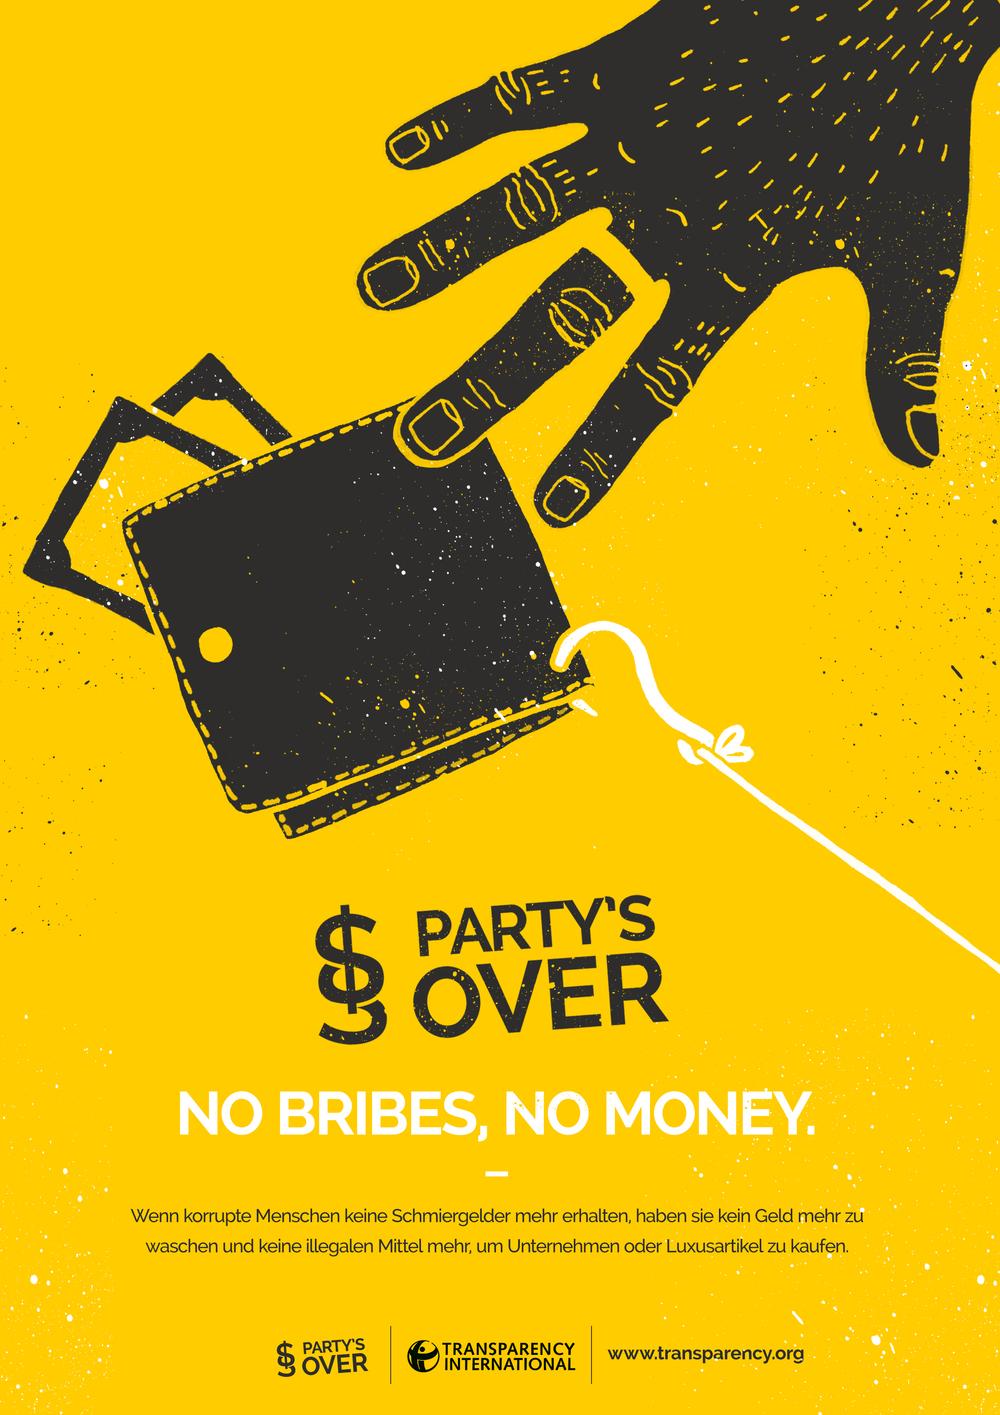 Transparency international poster002 bigger